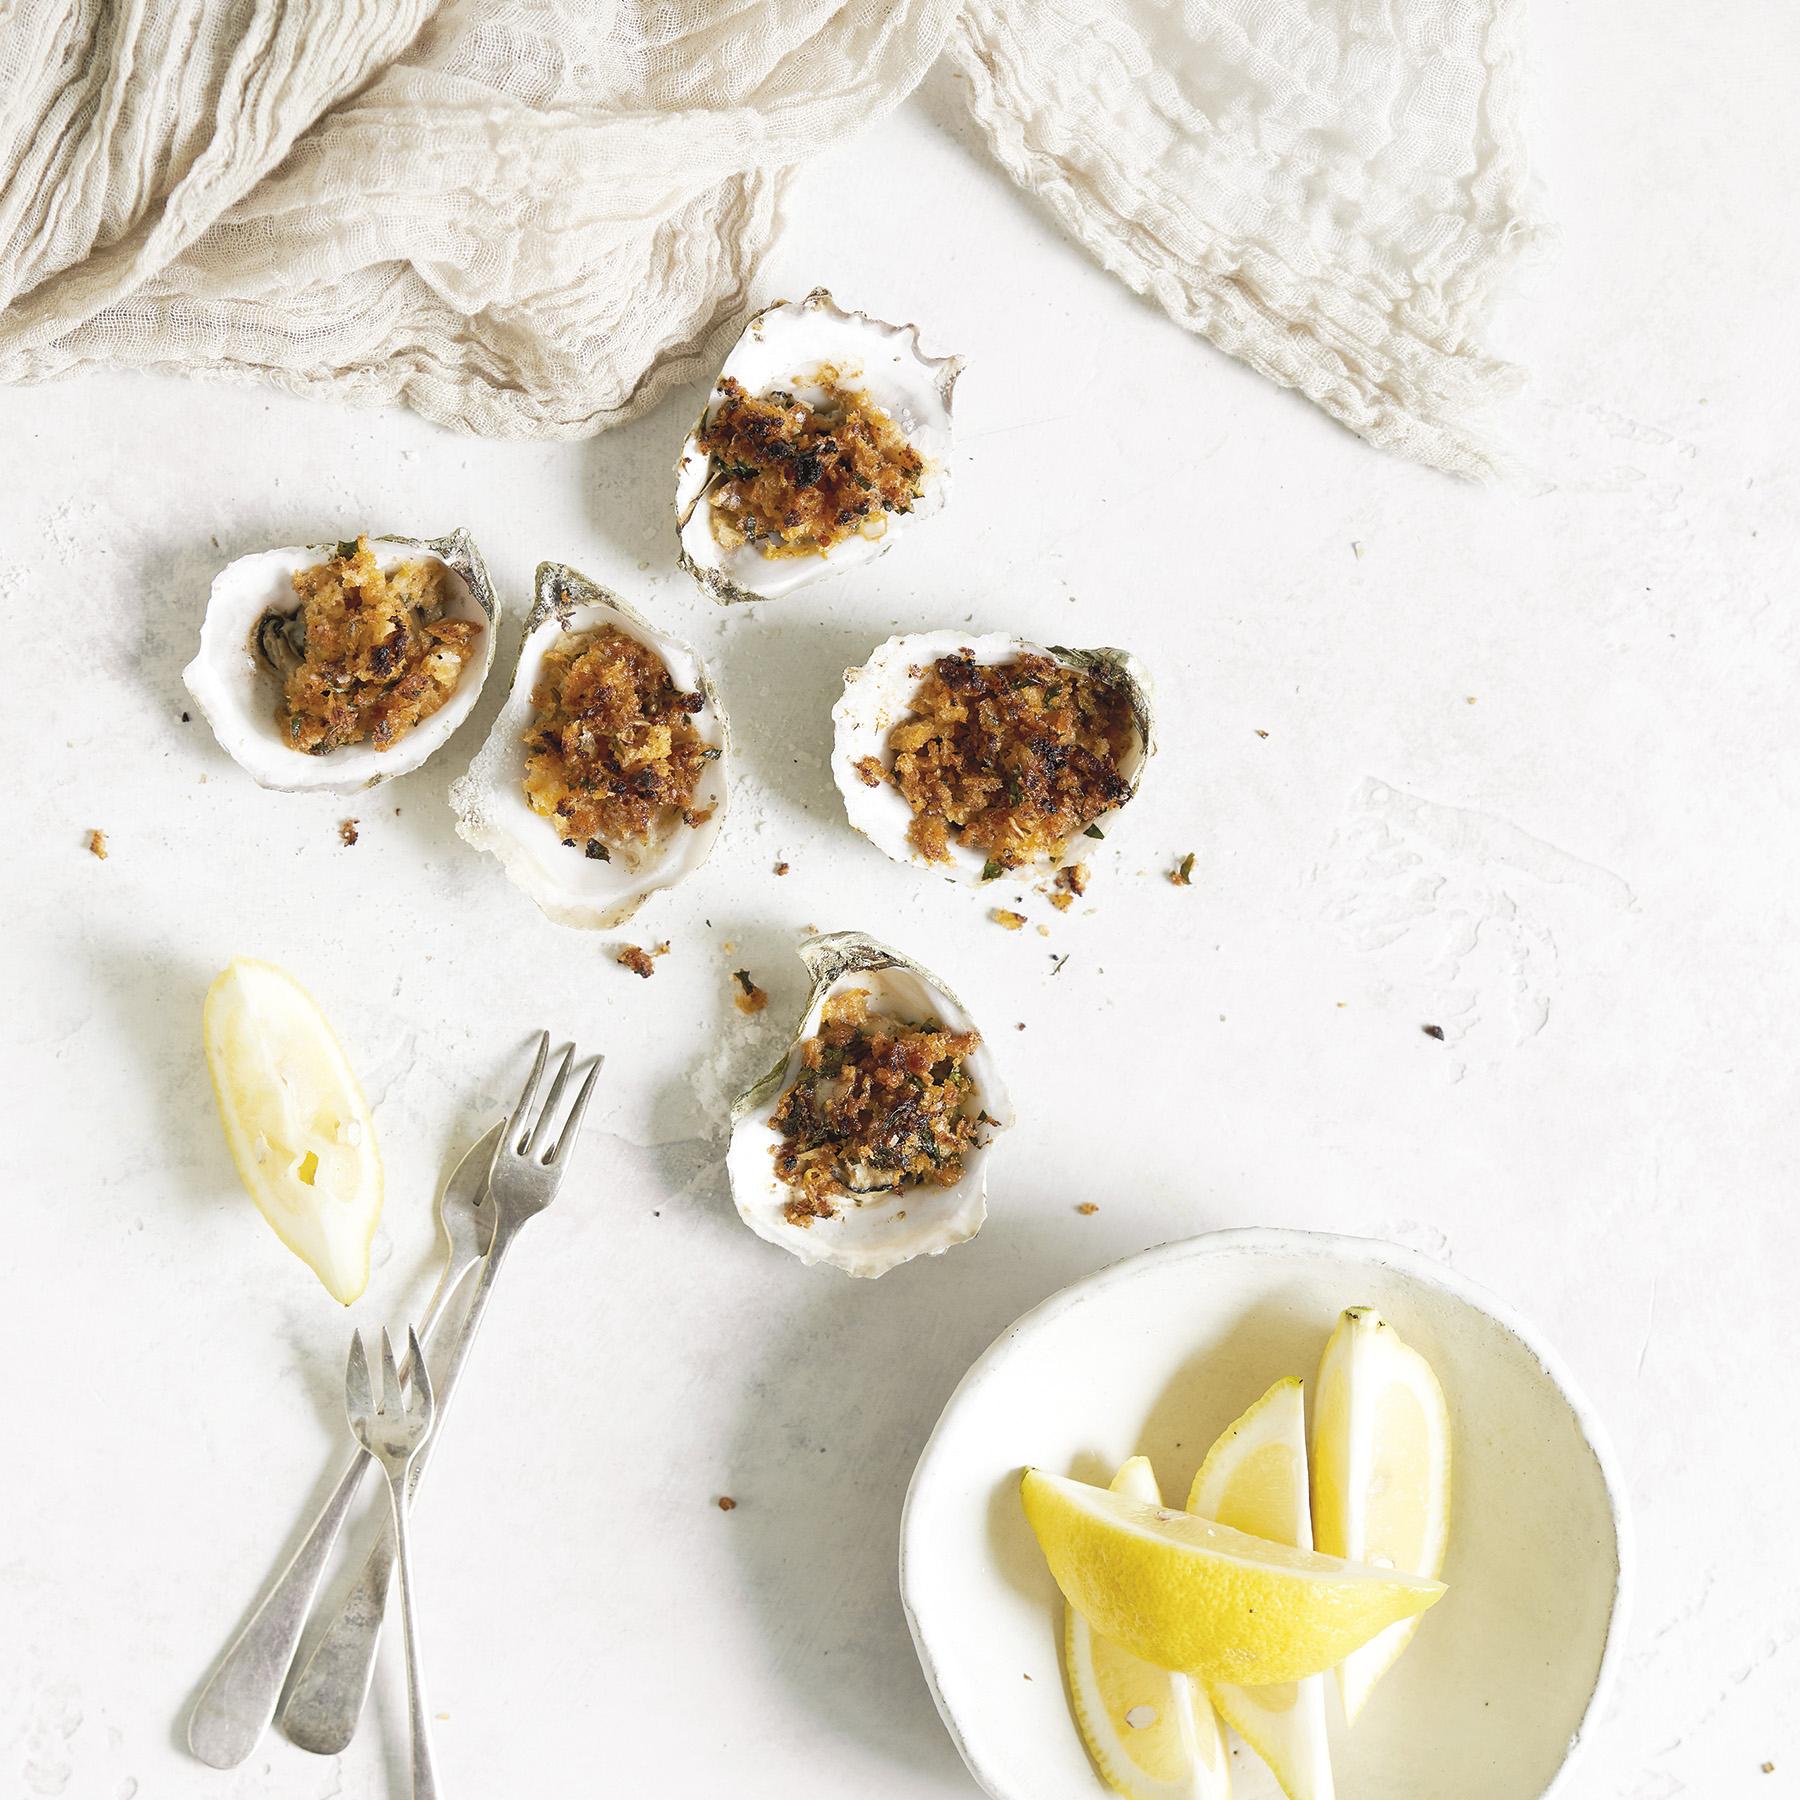 cajun-stuffed oysters